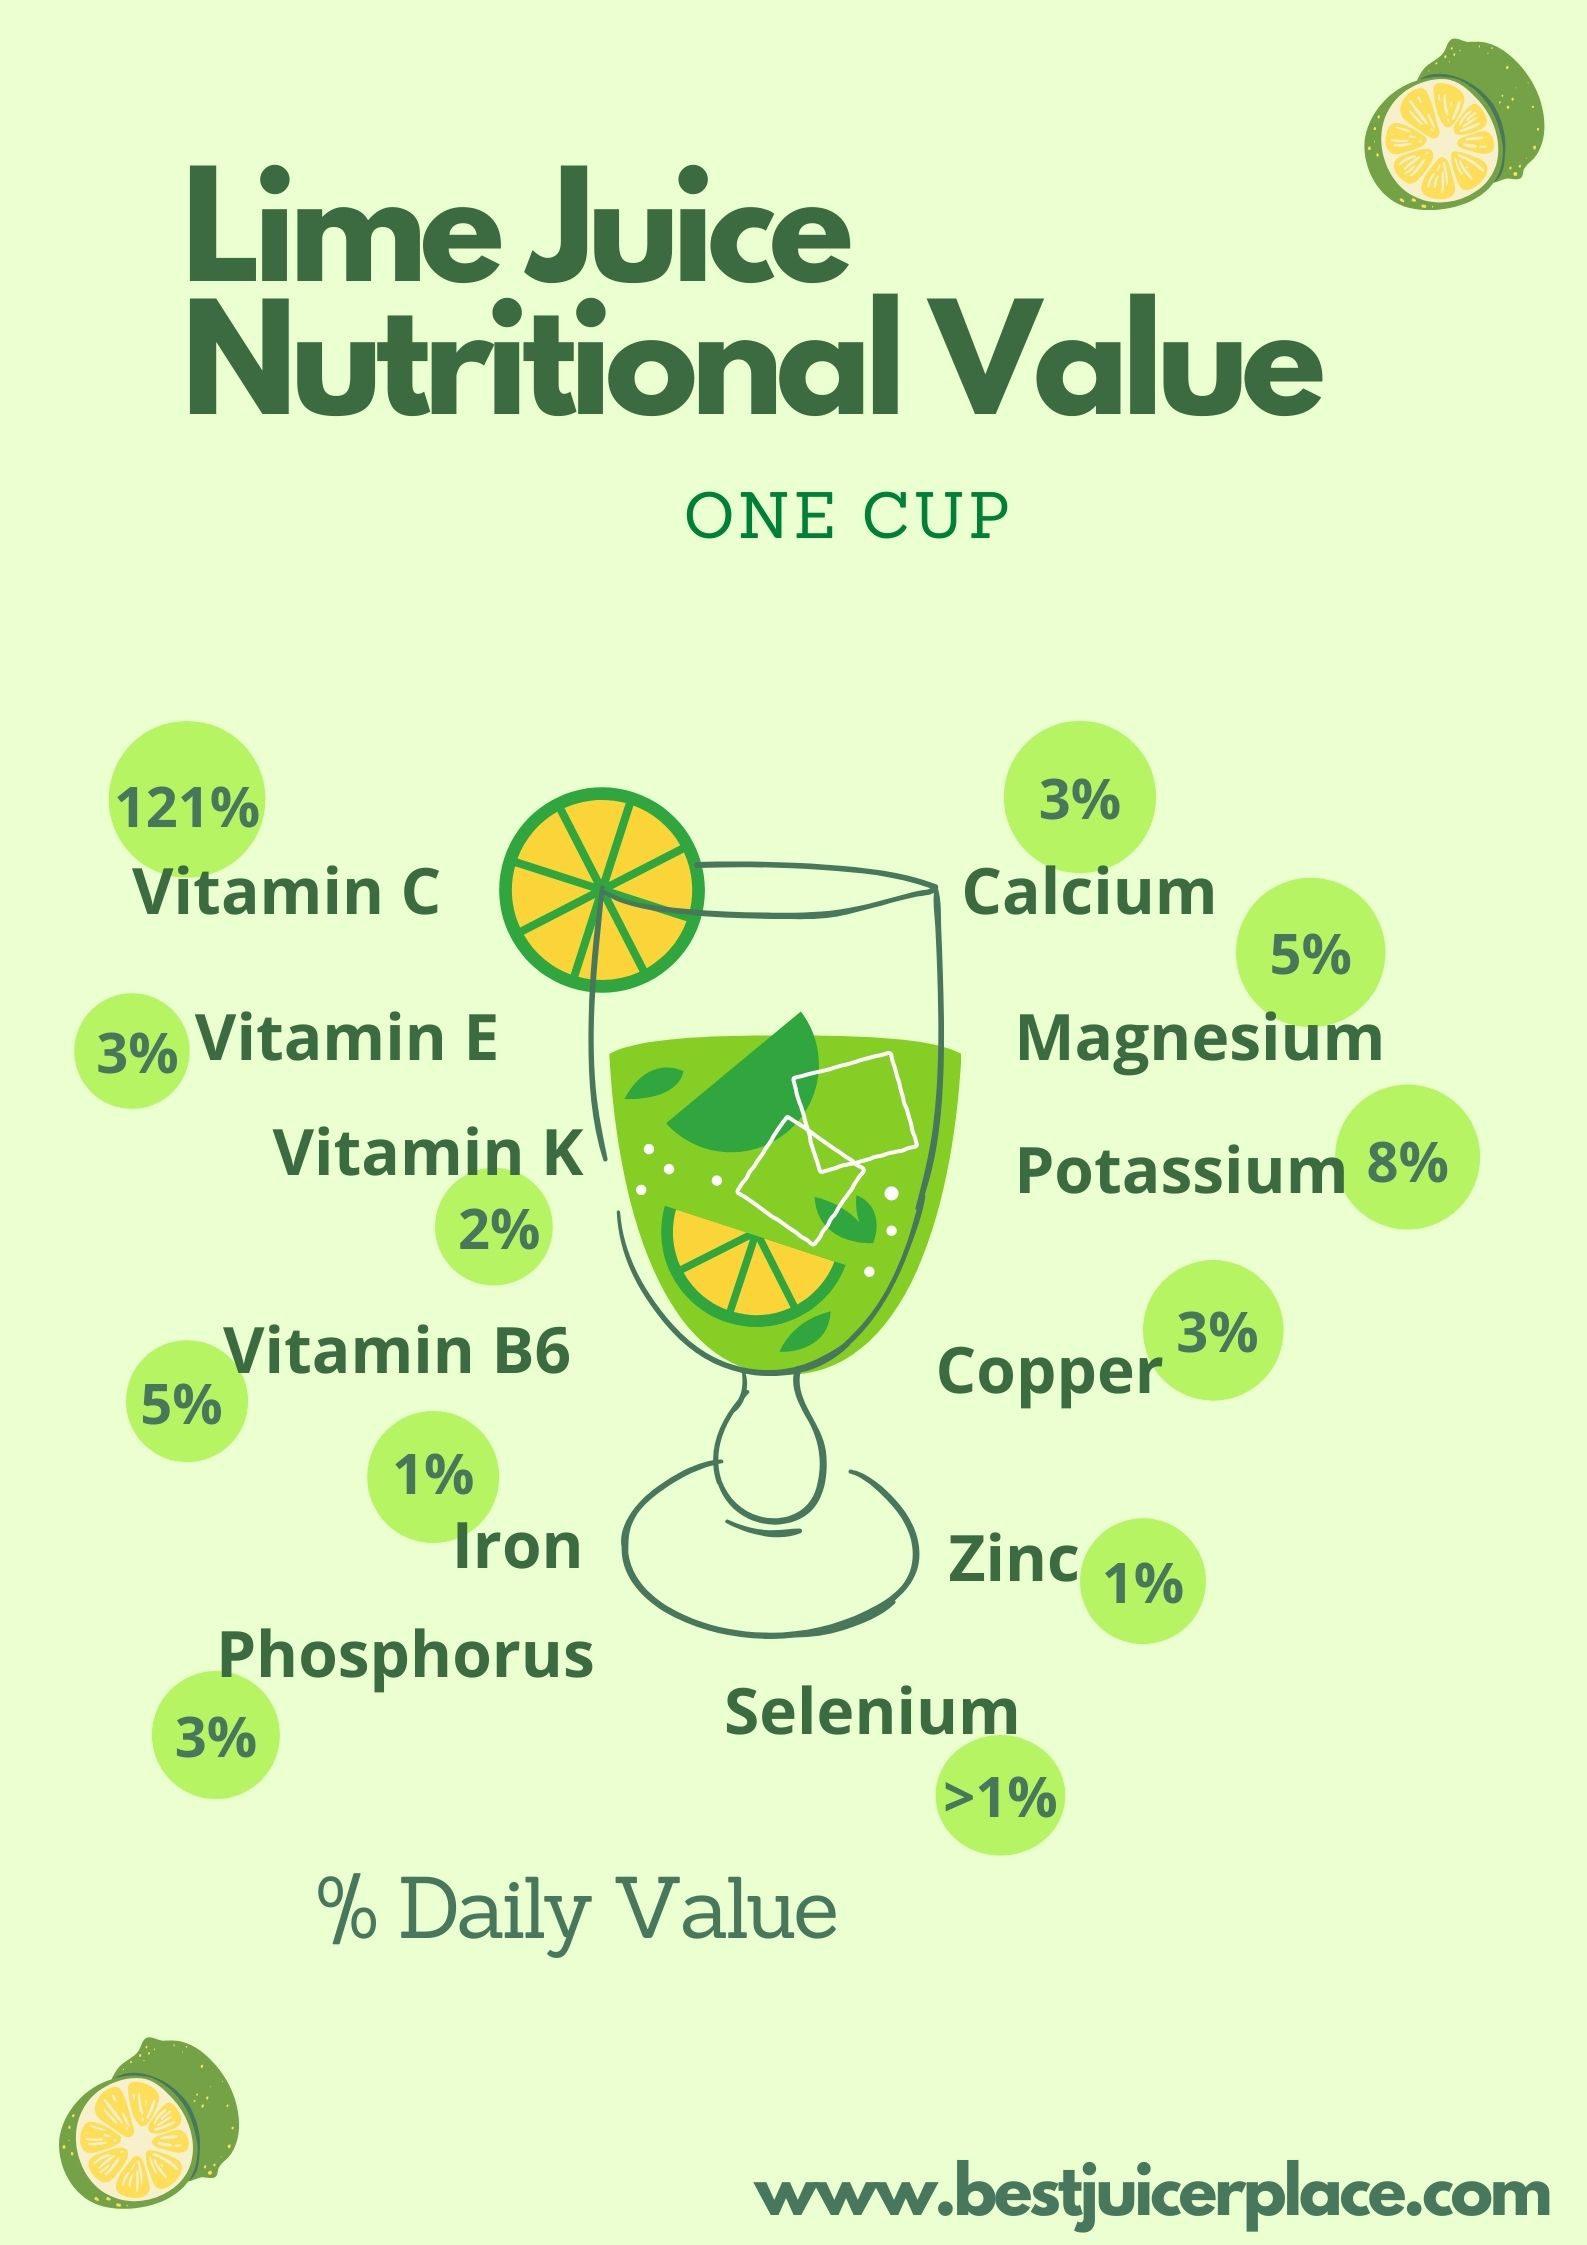 Lime juice nutritional value